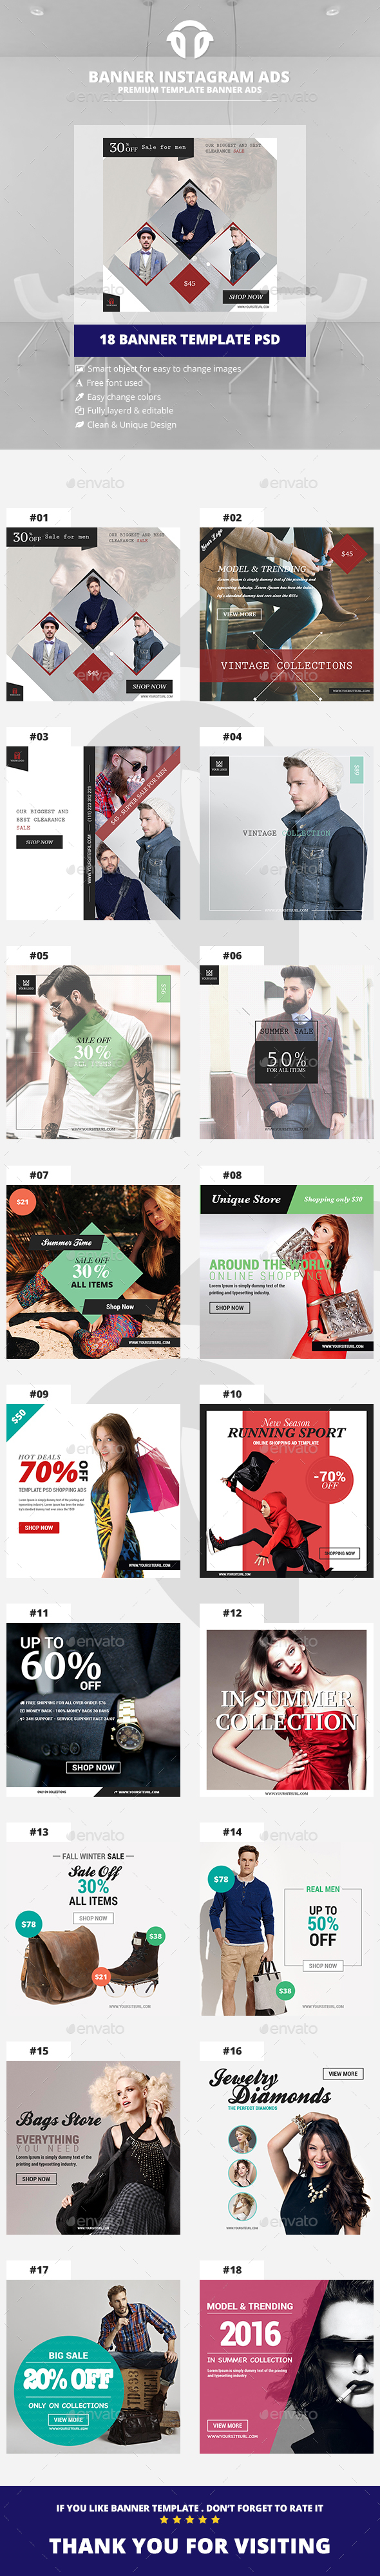 Bundle Instagram Banners Ads - Social Media Web Elements